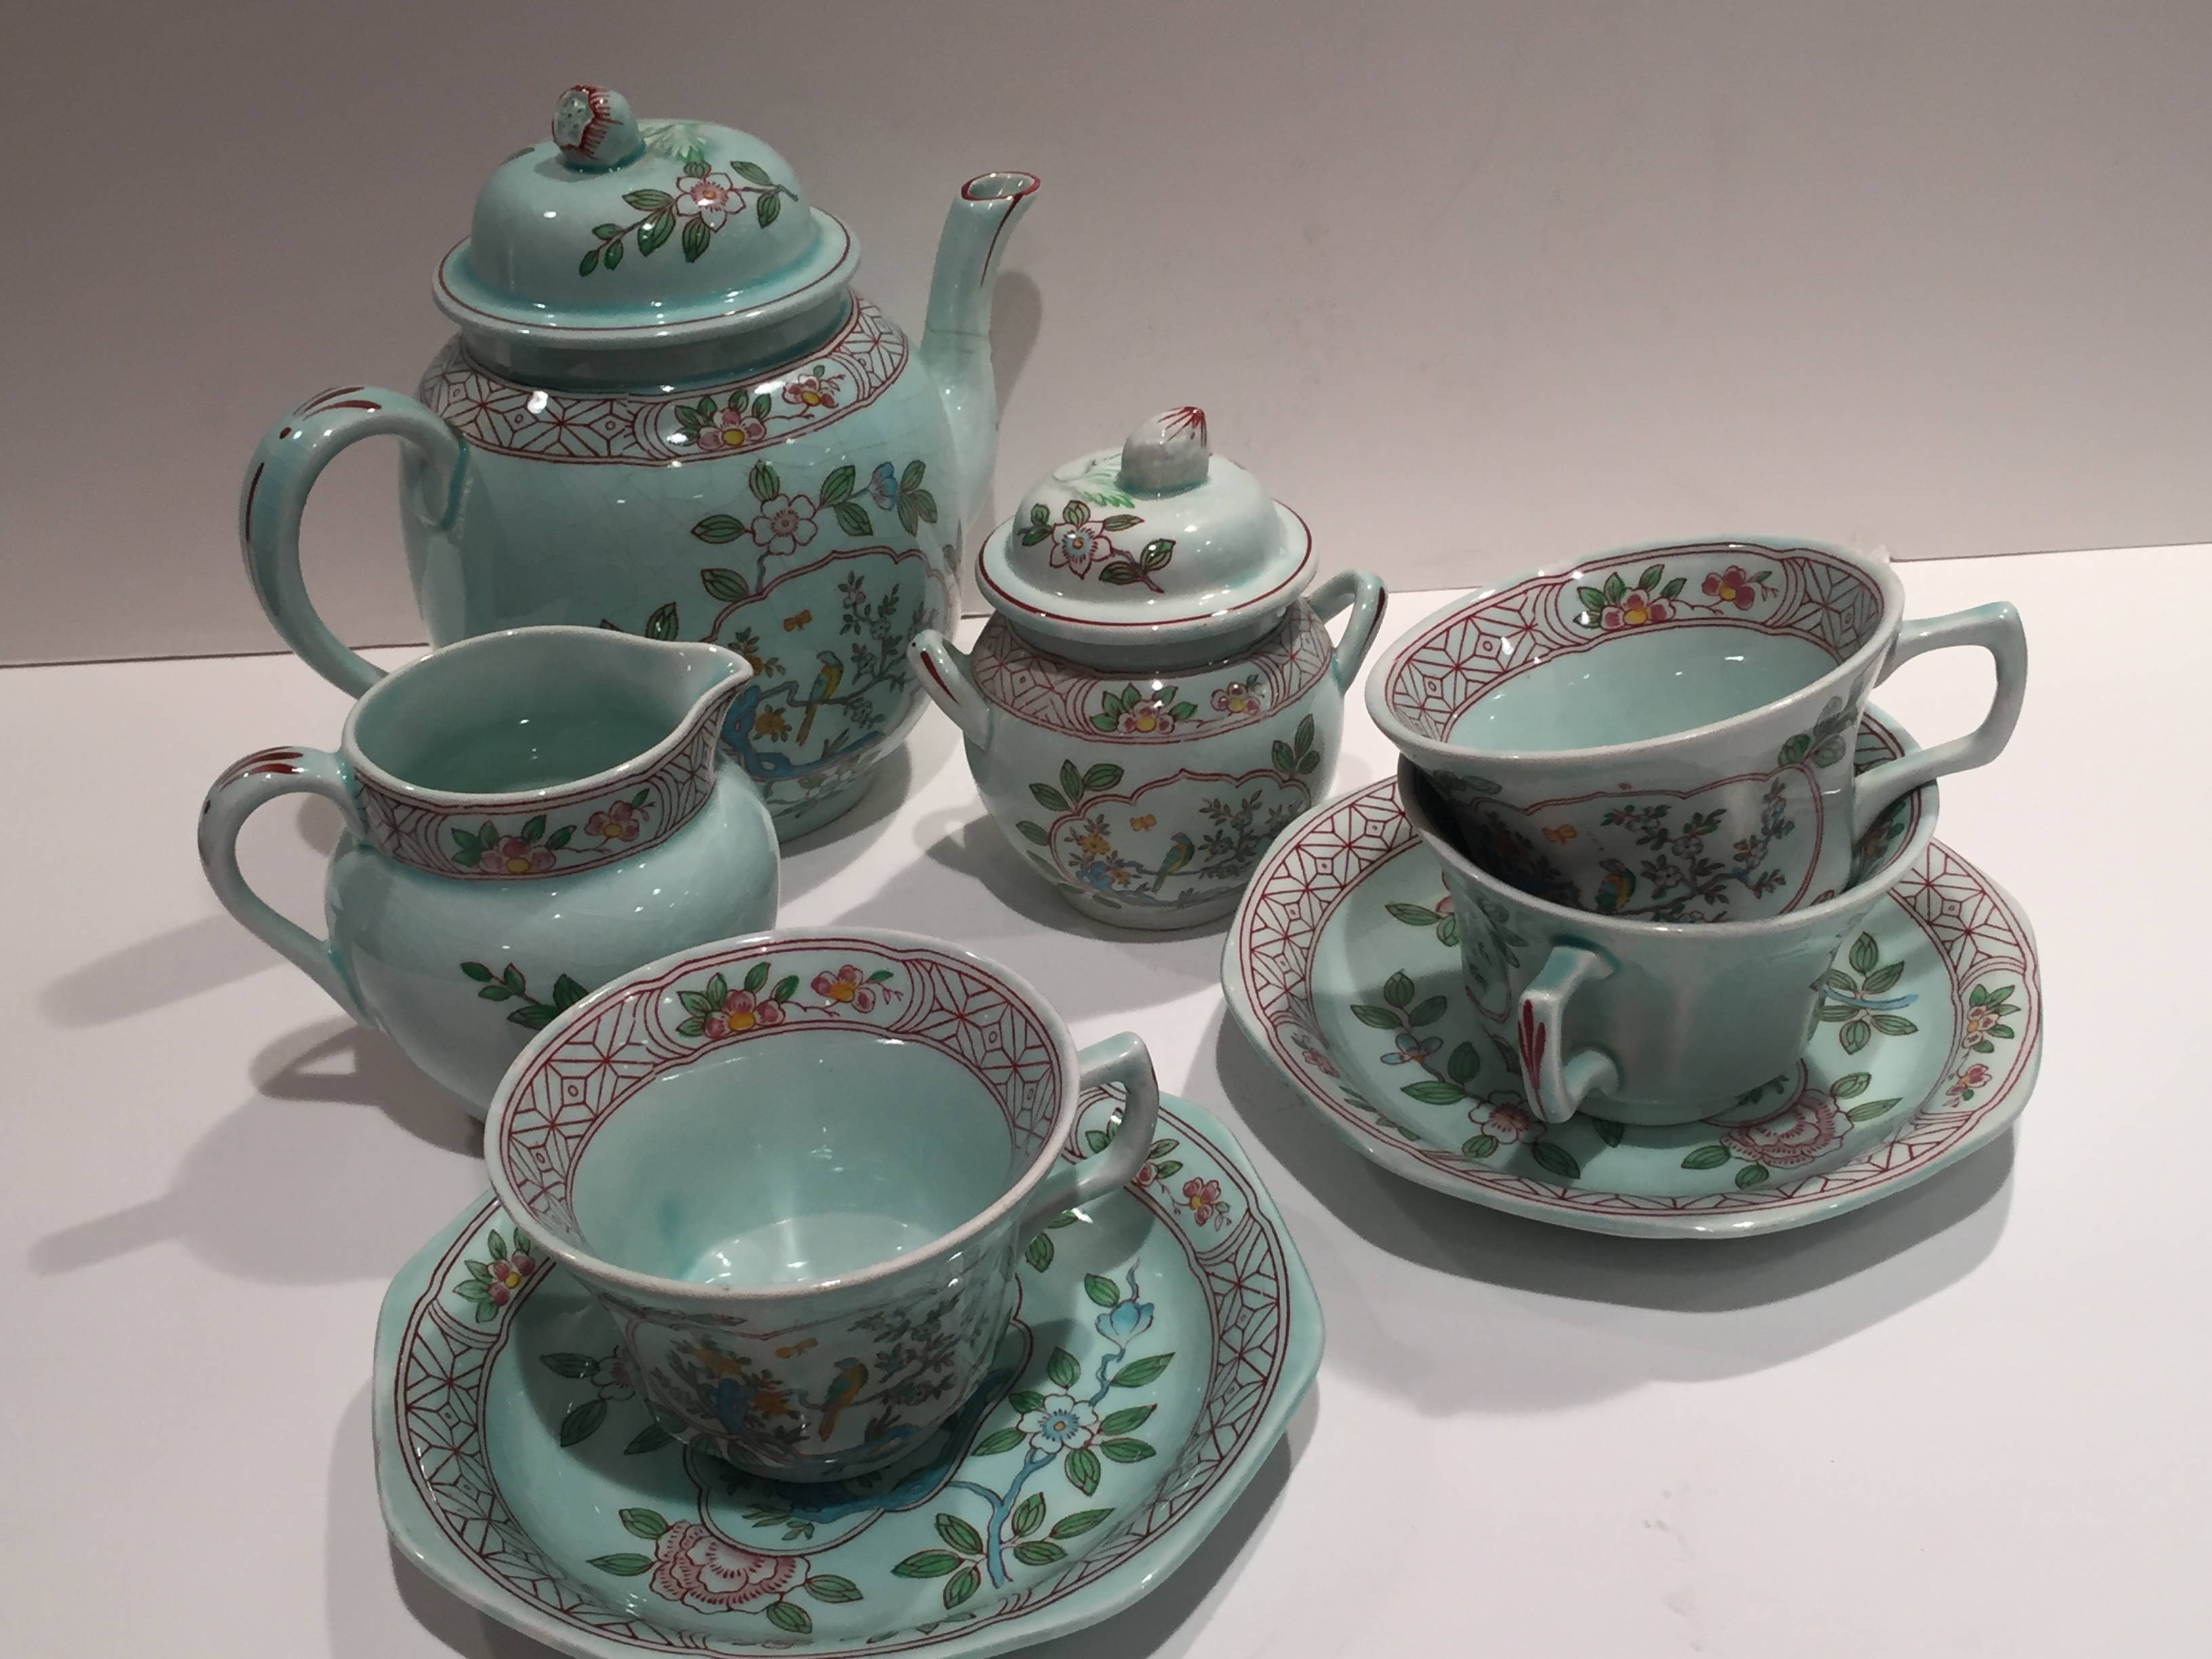 I Have 1 Wedgwood English Ironstone Micratex Ware Tea Pot 8 Tall